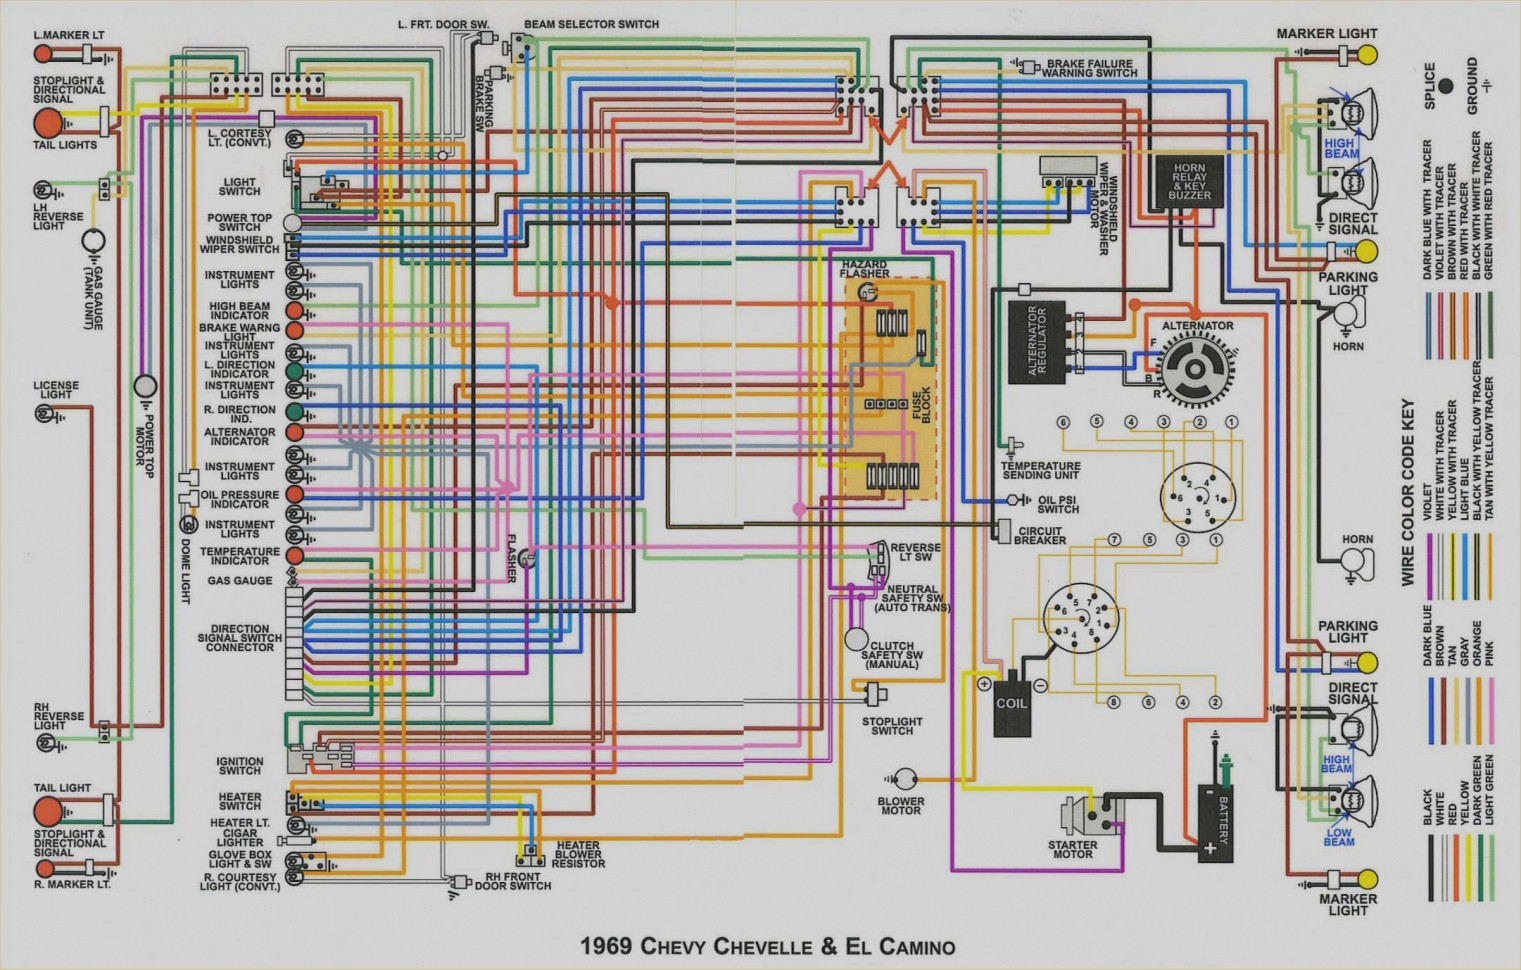 [SCHEMATICS_4JK]  KR_5829] 1963 Chevy Impala Ignition Wiring For Free Diagram | 1966 Impala Wagon Wiring Diagram |  | Kweca Rous Wigeg Onom Socad Nizat Hyedi Mohammedshrine Librar Wiring 101